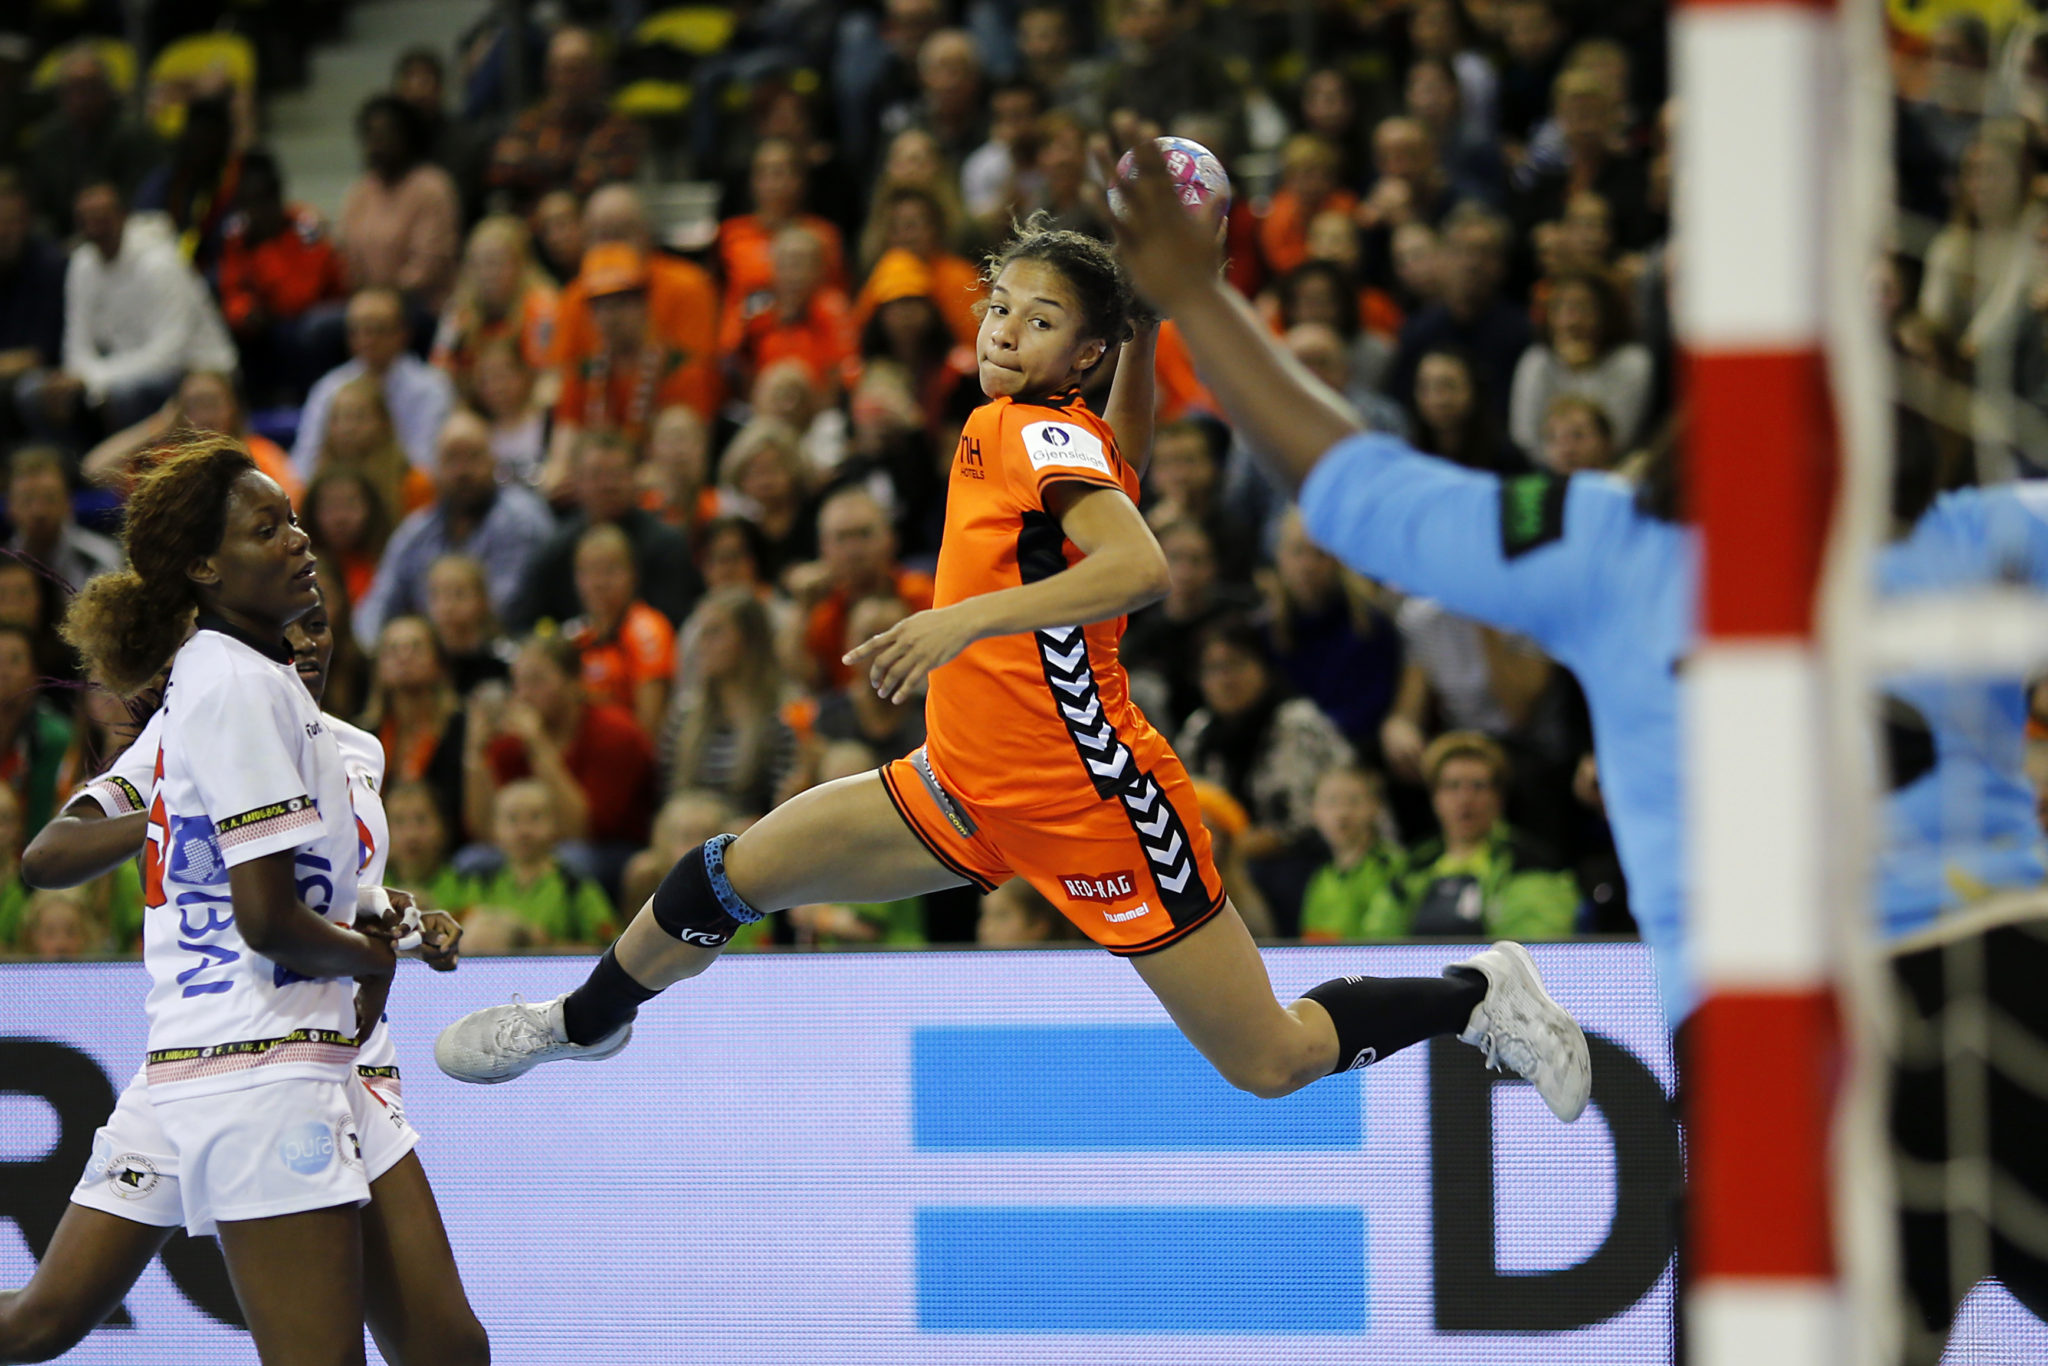 21 November 2018: Handbal: Nederland-Angola: Eindehoven   Foto: Edwin Verheul